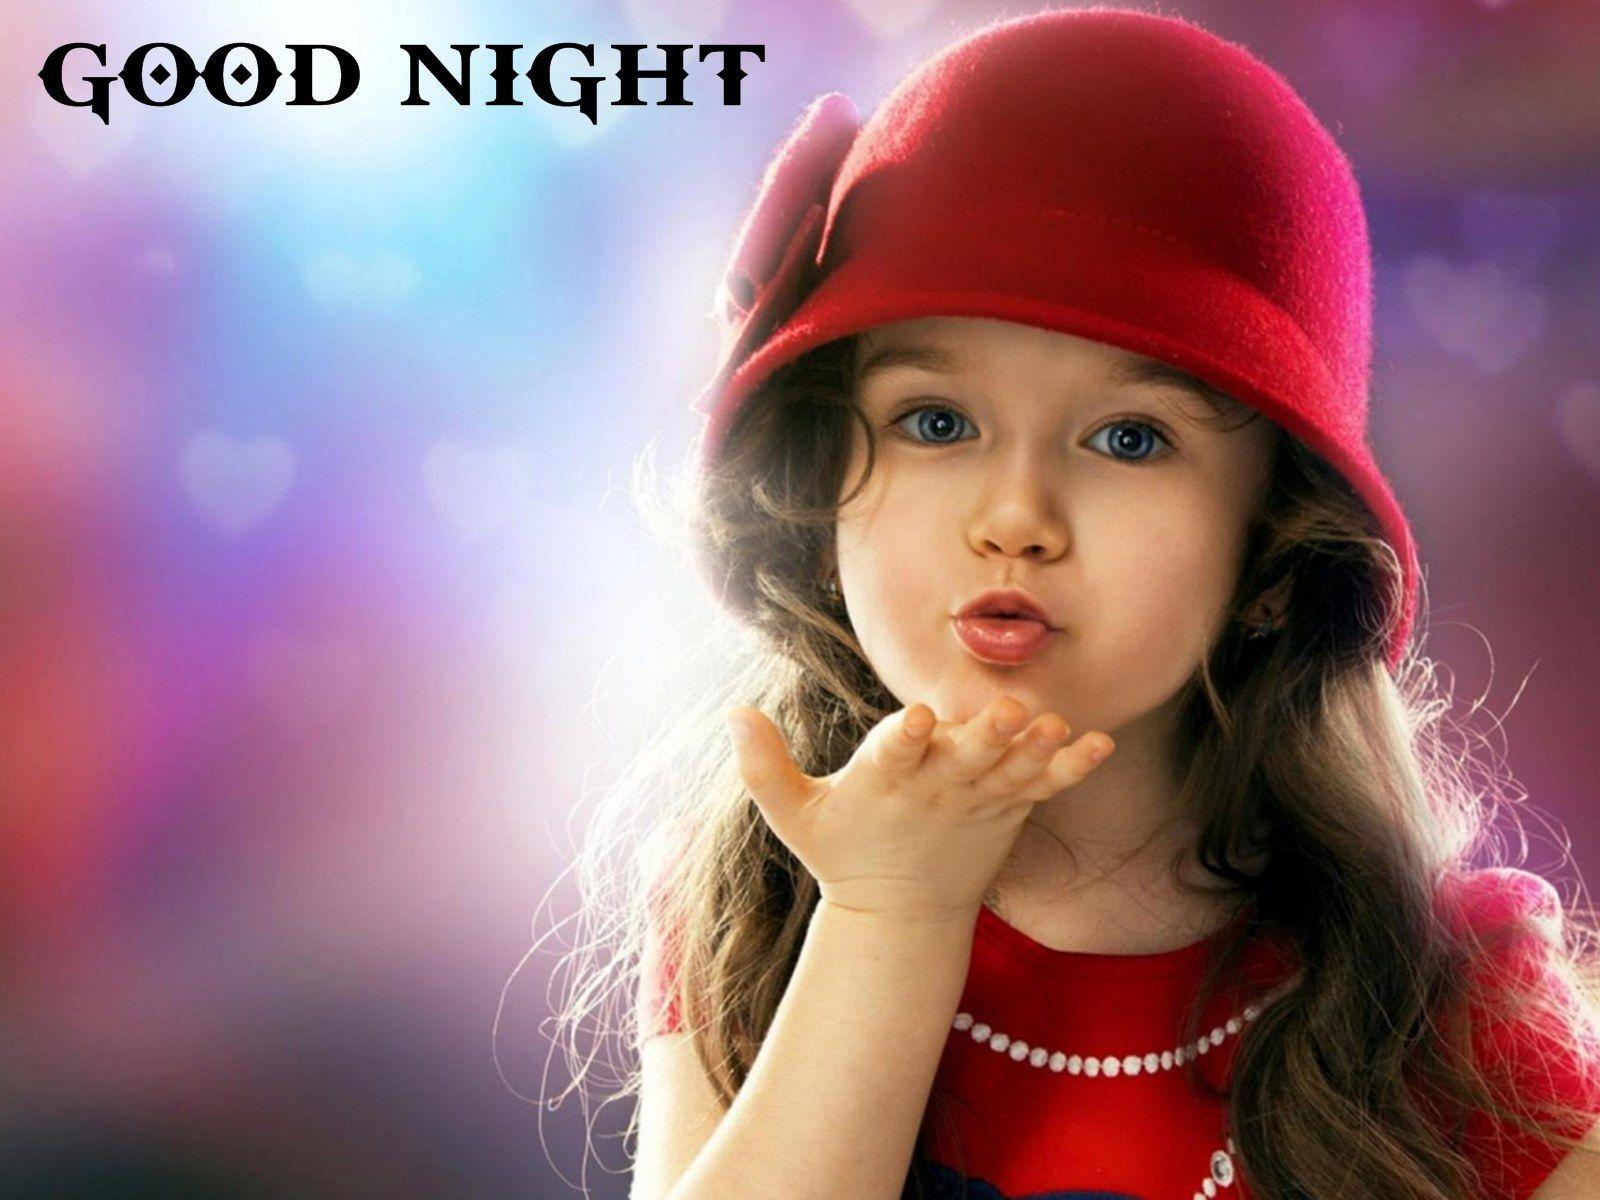 Beautiful Little Girl Giving You Good Night Flying Kiss -1598